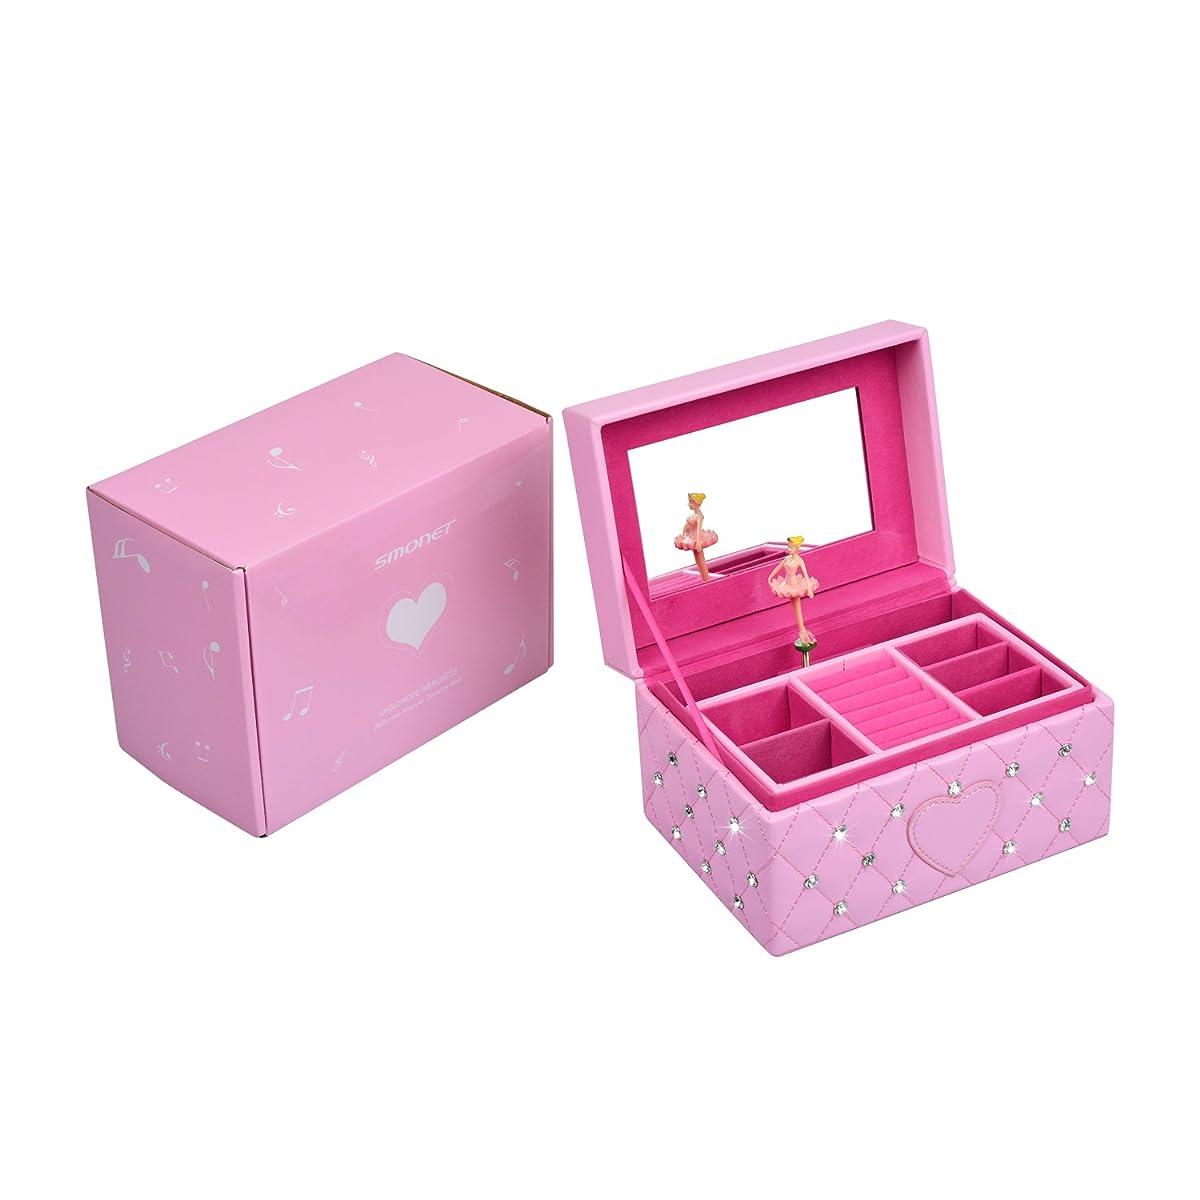 SMONET Musical Jewelry Box Ballerina Girls Jewel Storage Case Pink For Elise